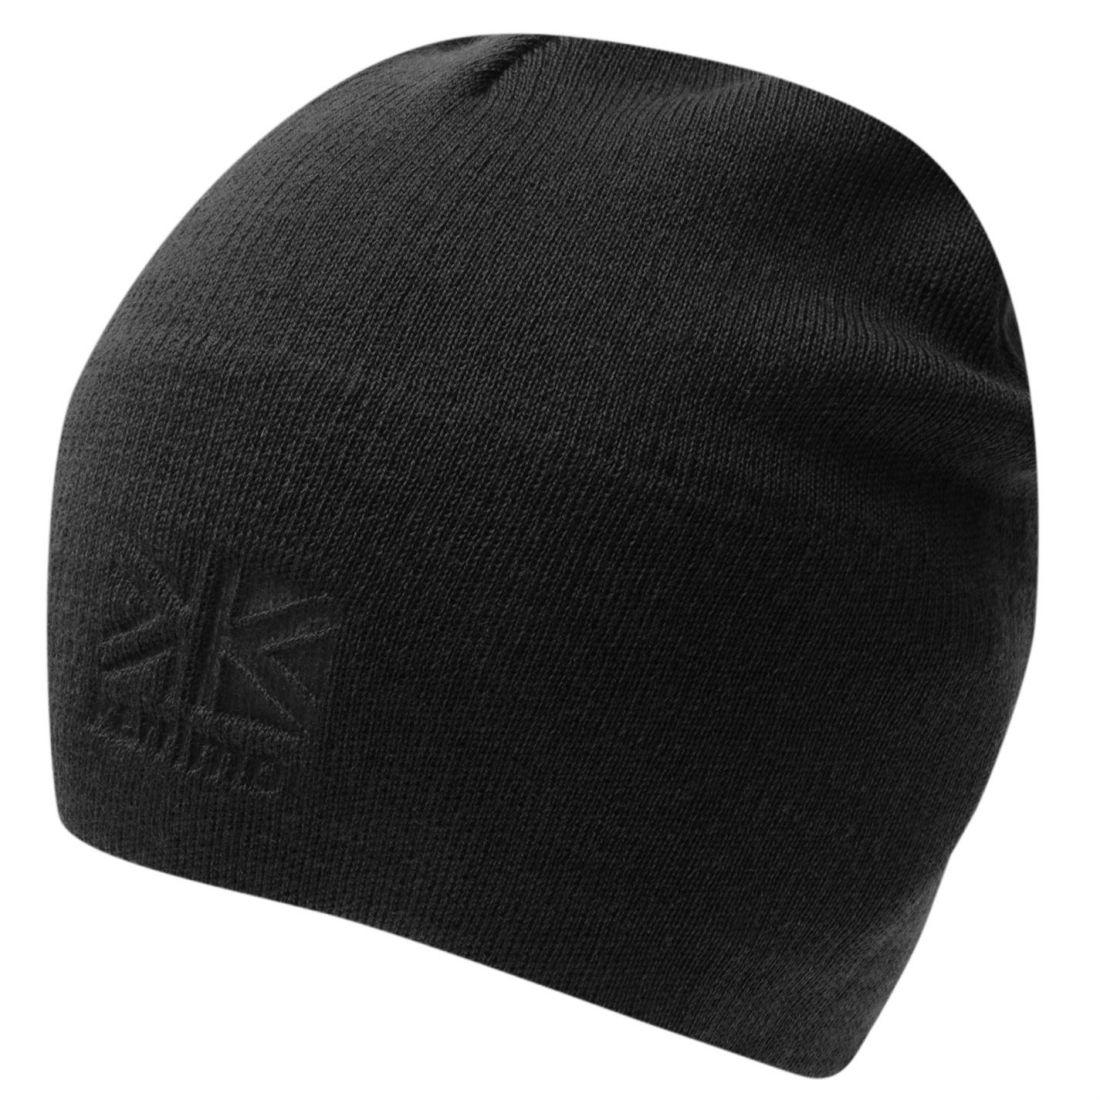 7b8a304933c Image is loading Karrimor-X-Lite-Beanie-Winter-Hat-Mens